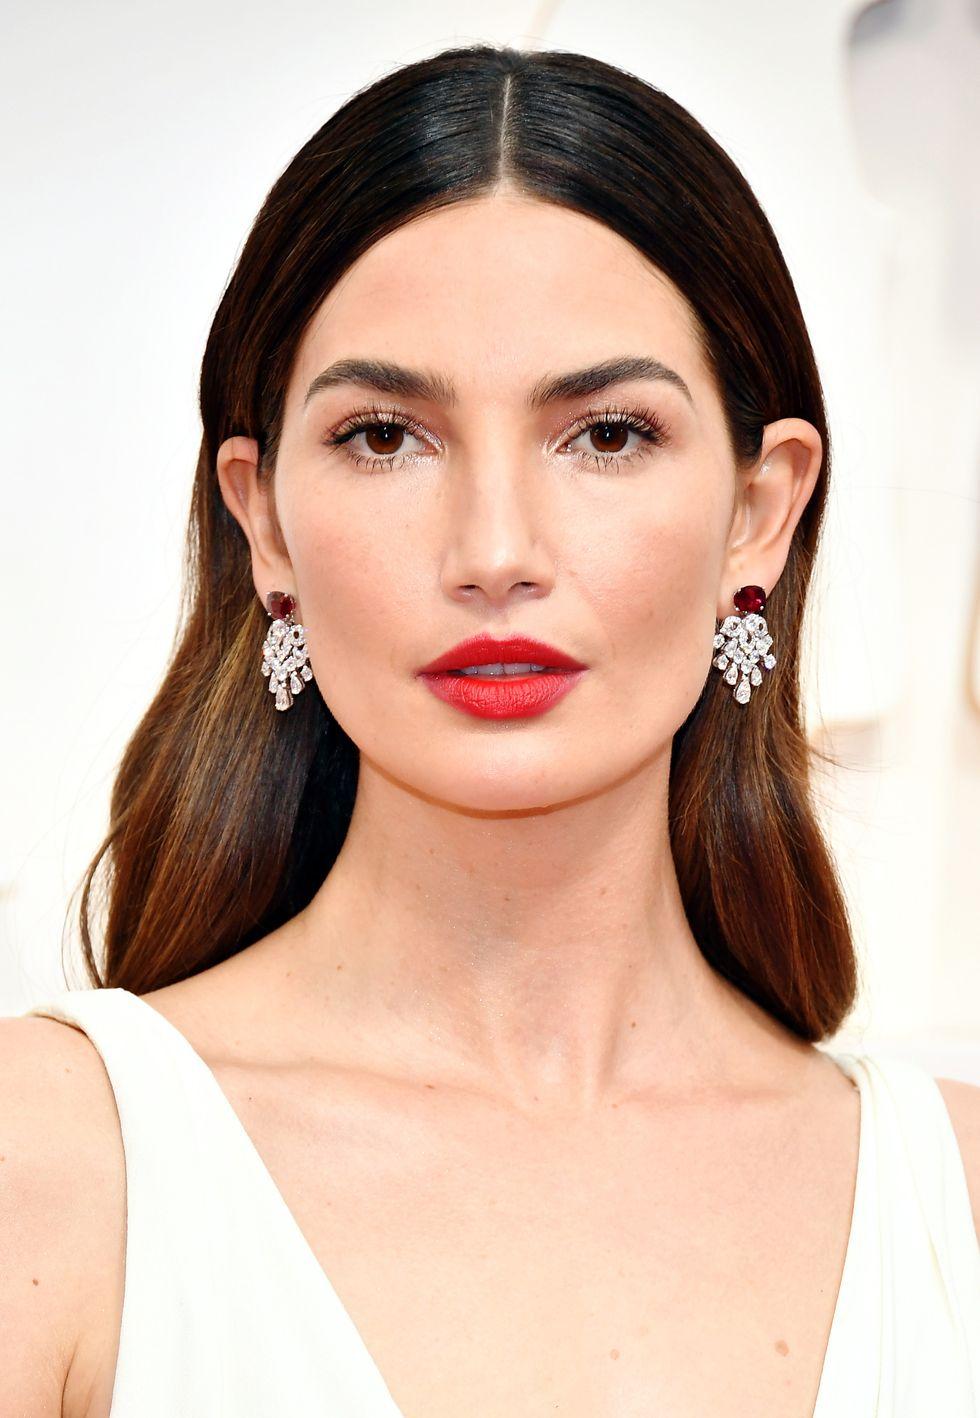 Best Beauty Looks @ Premiile Oscar 2020